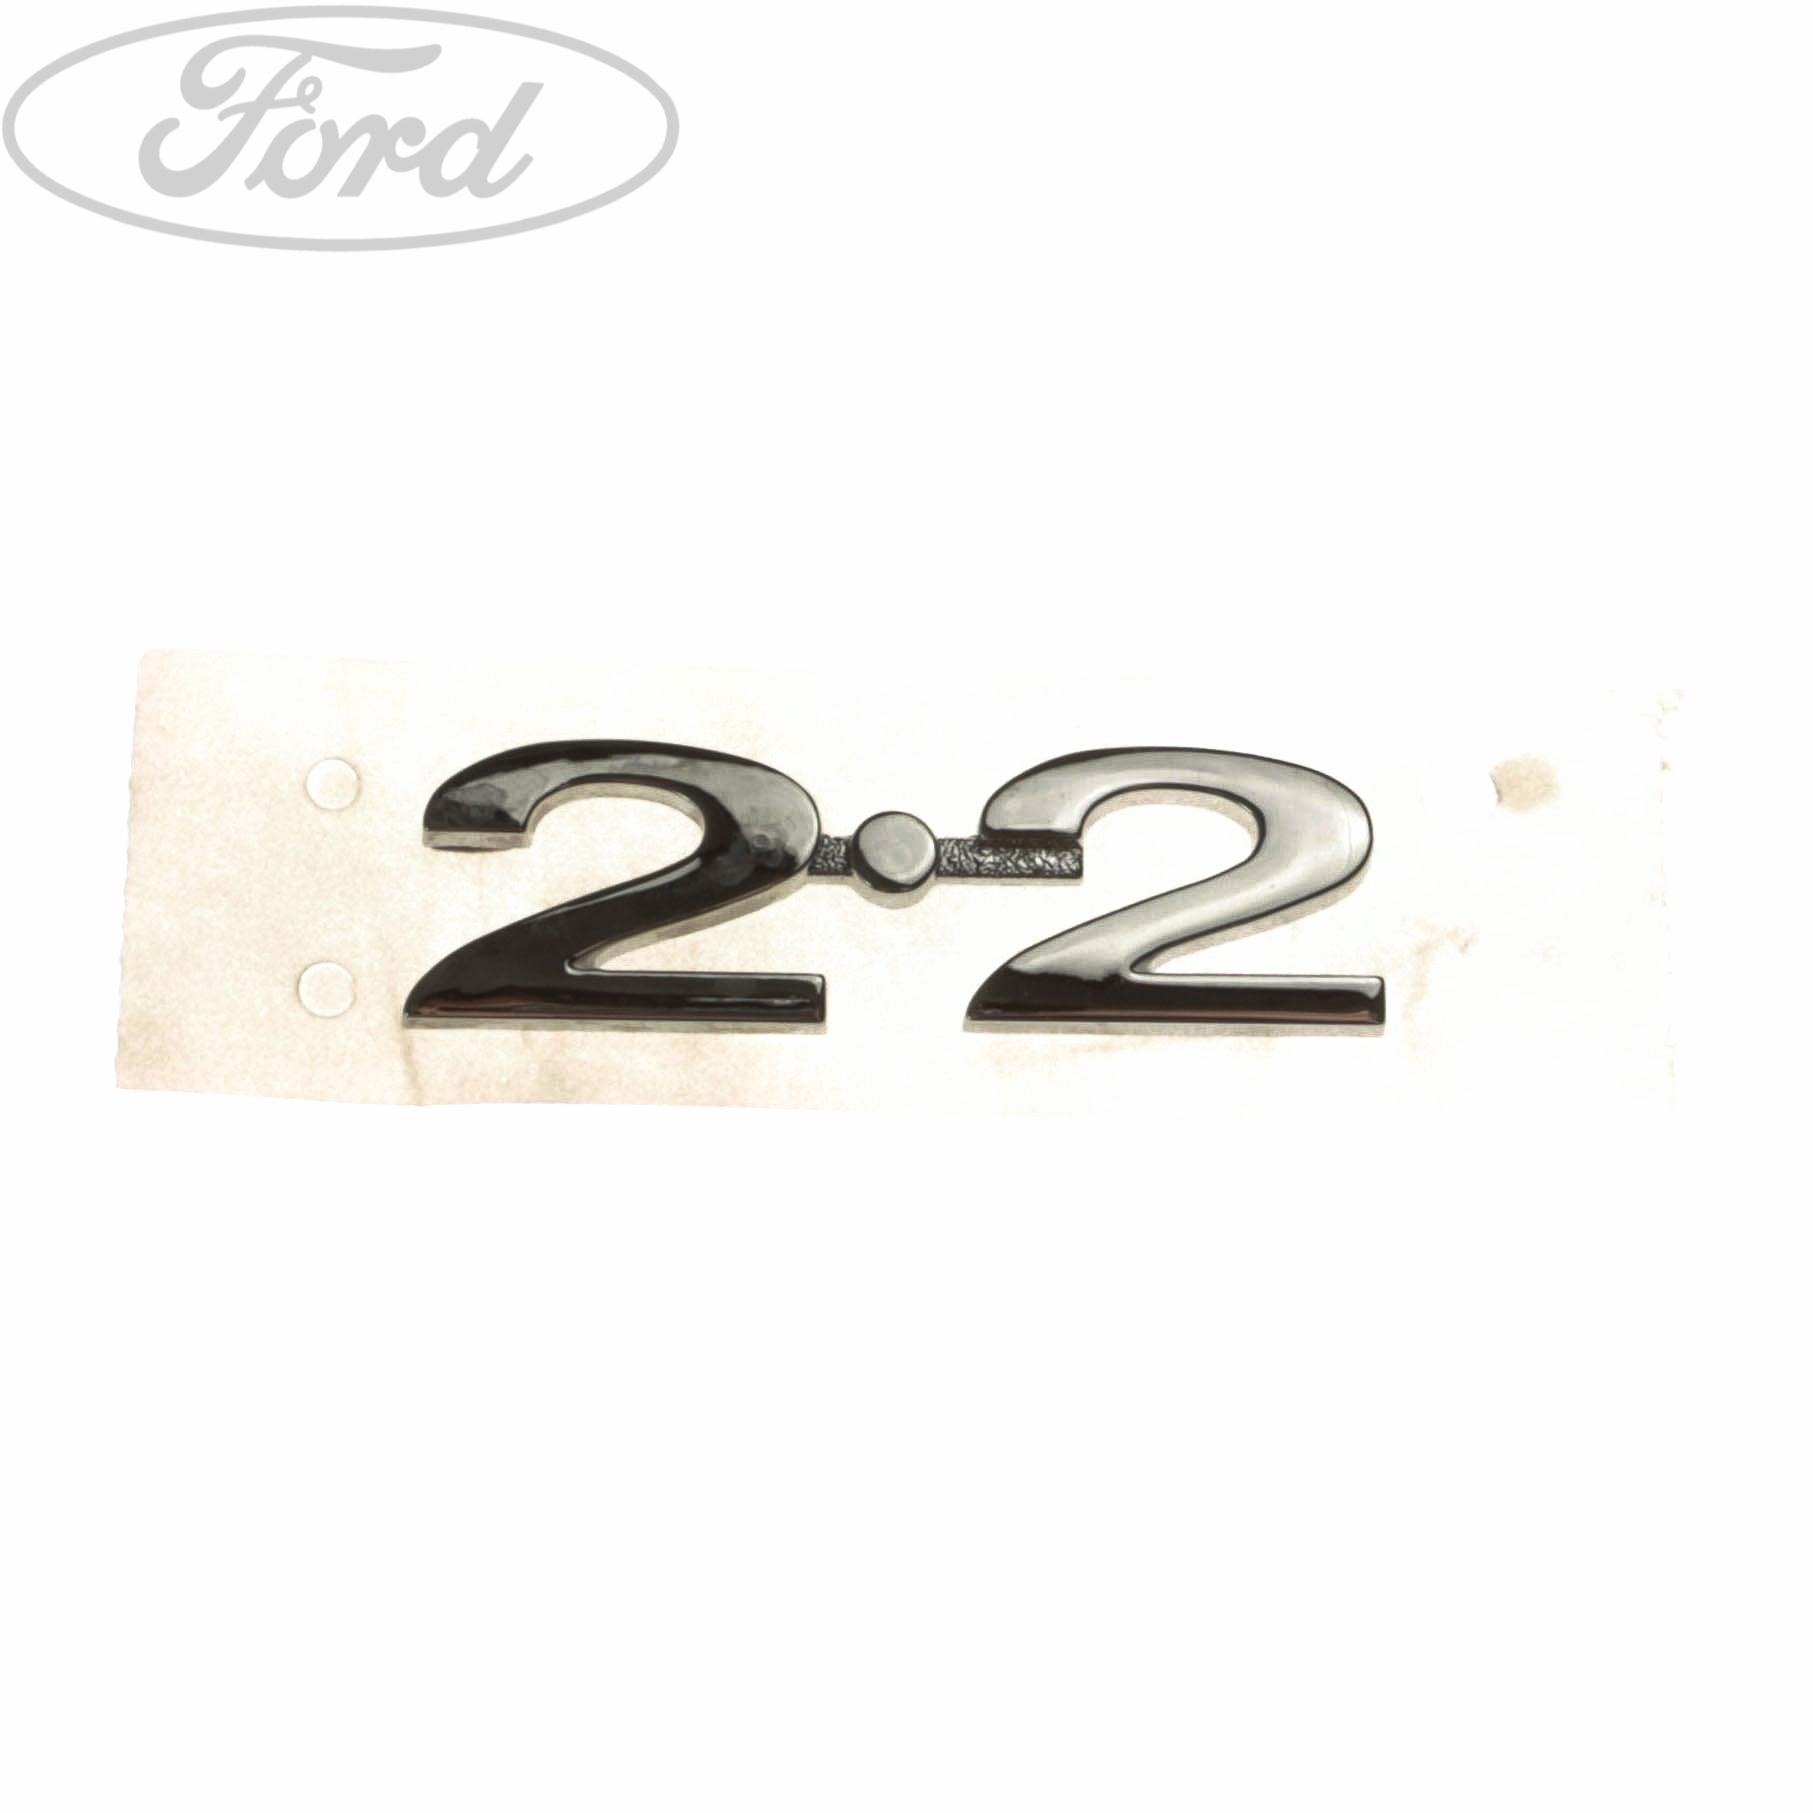 Genuine ford mondeo mk4 s max mondeo mk4 2 2 name plate badge emblem 1688861